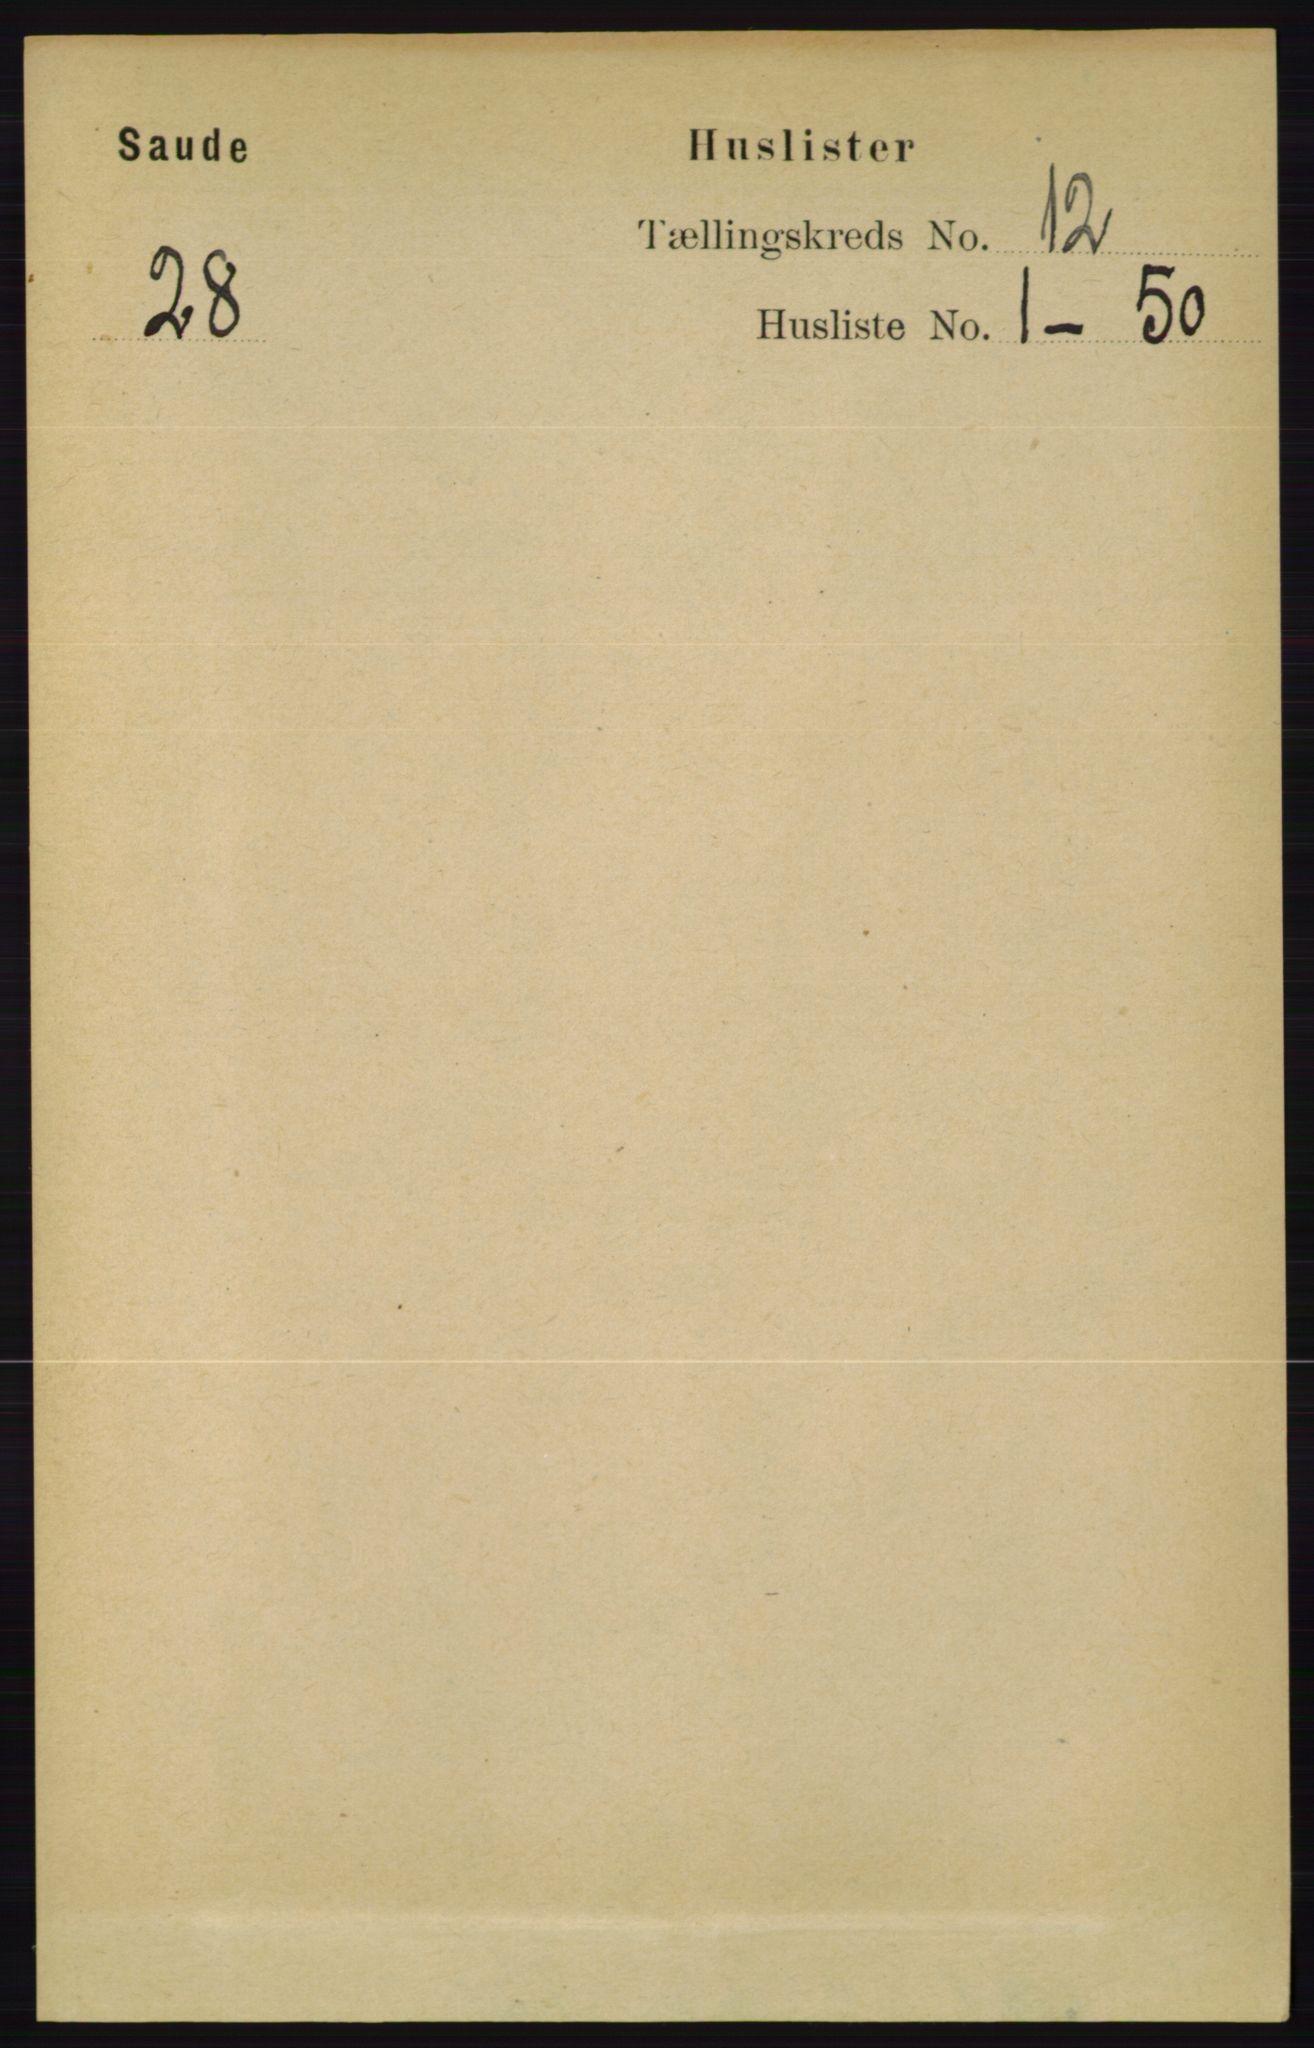 RA, Folketelling 1891 for 0822 Sauherad herred, 1891, s. 3564